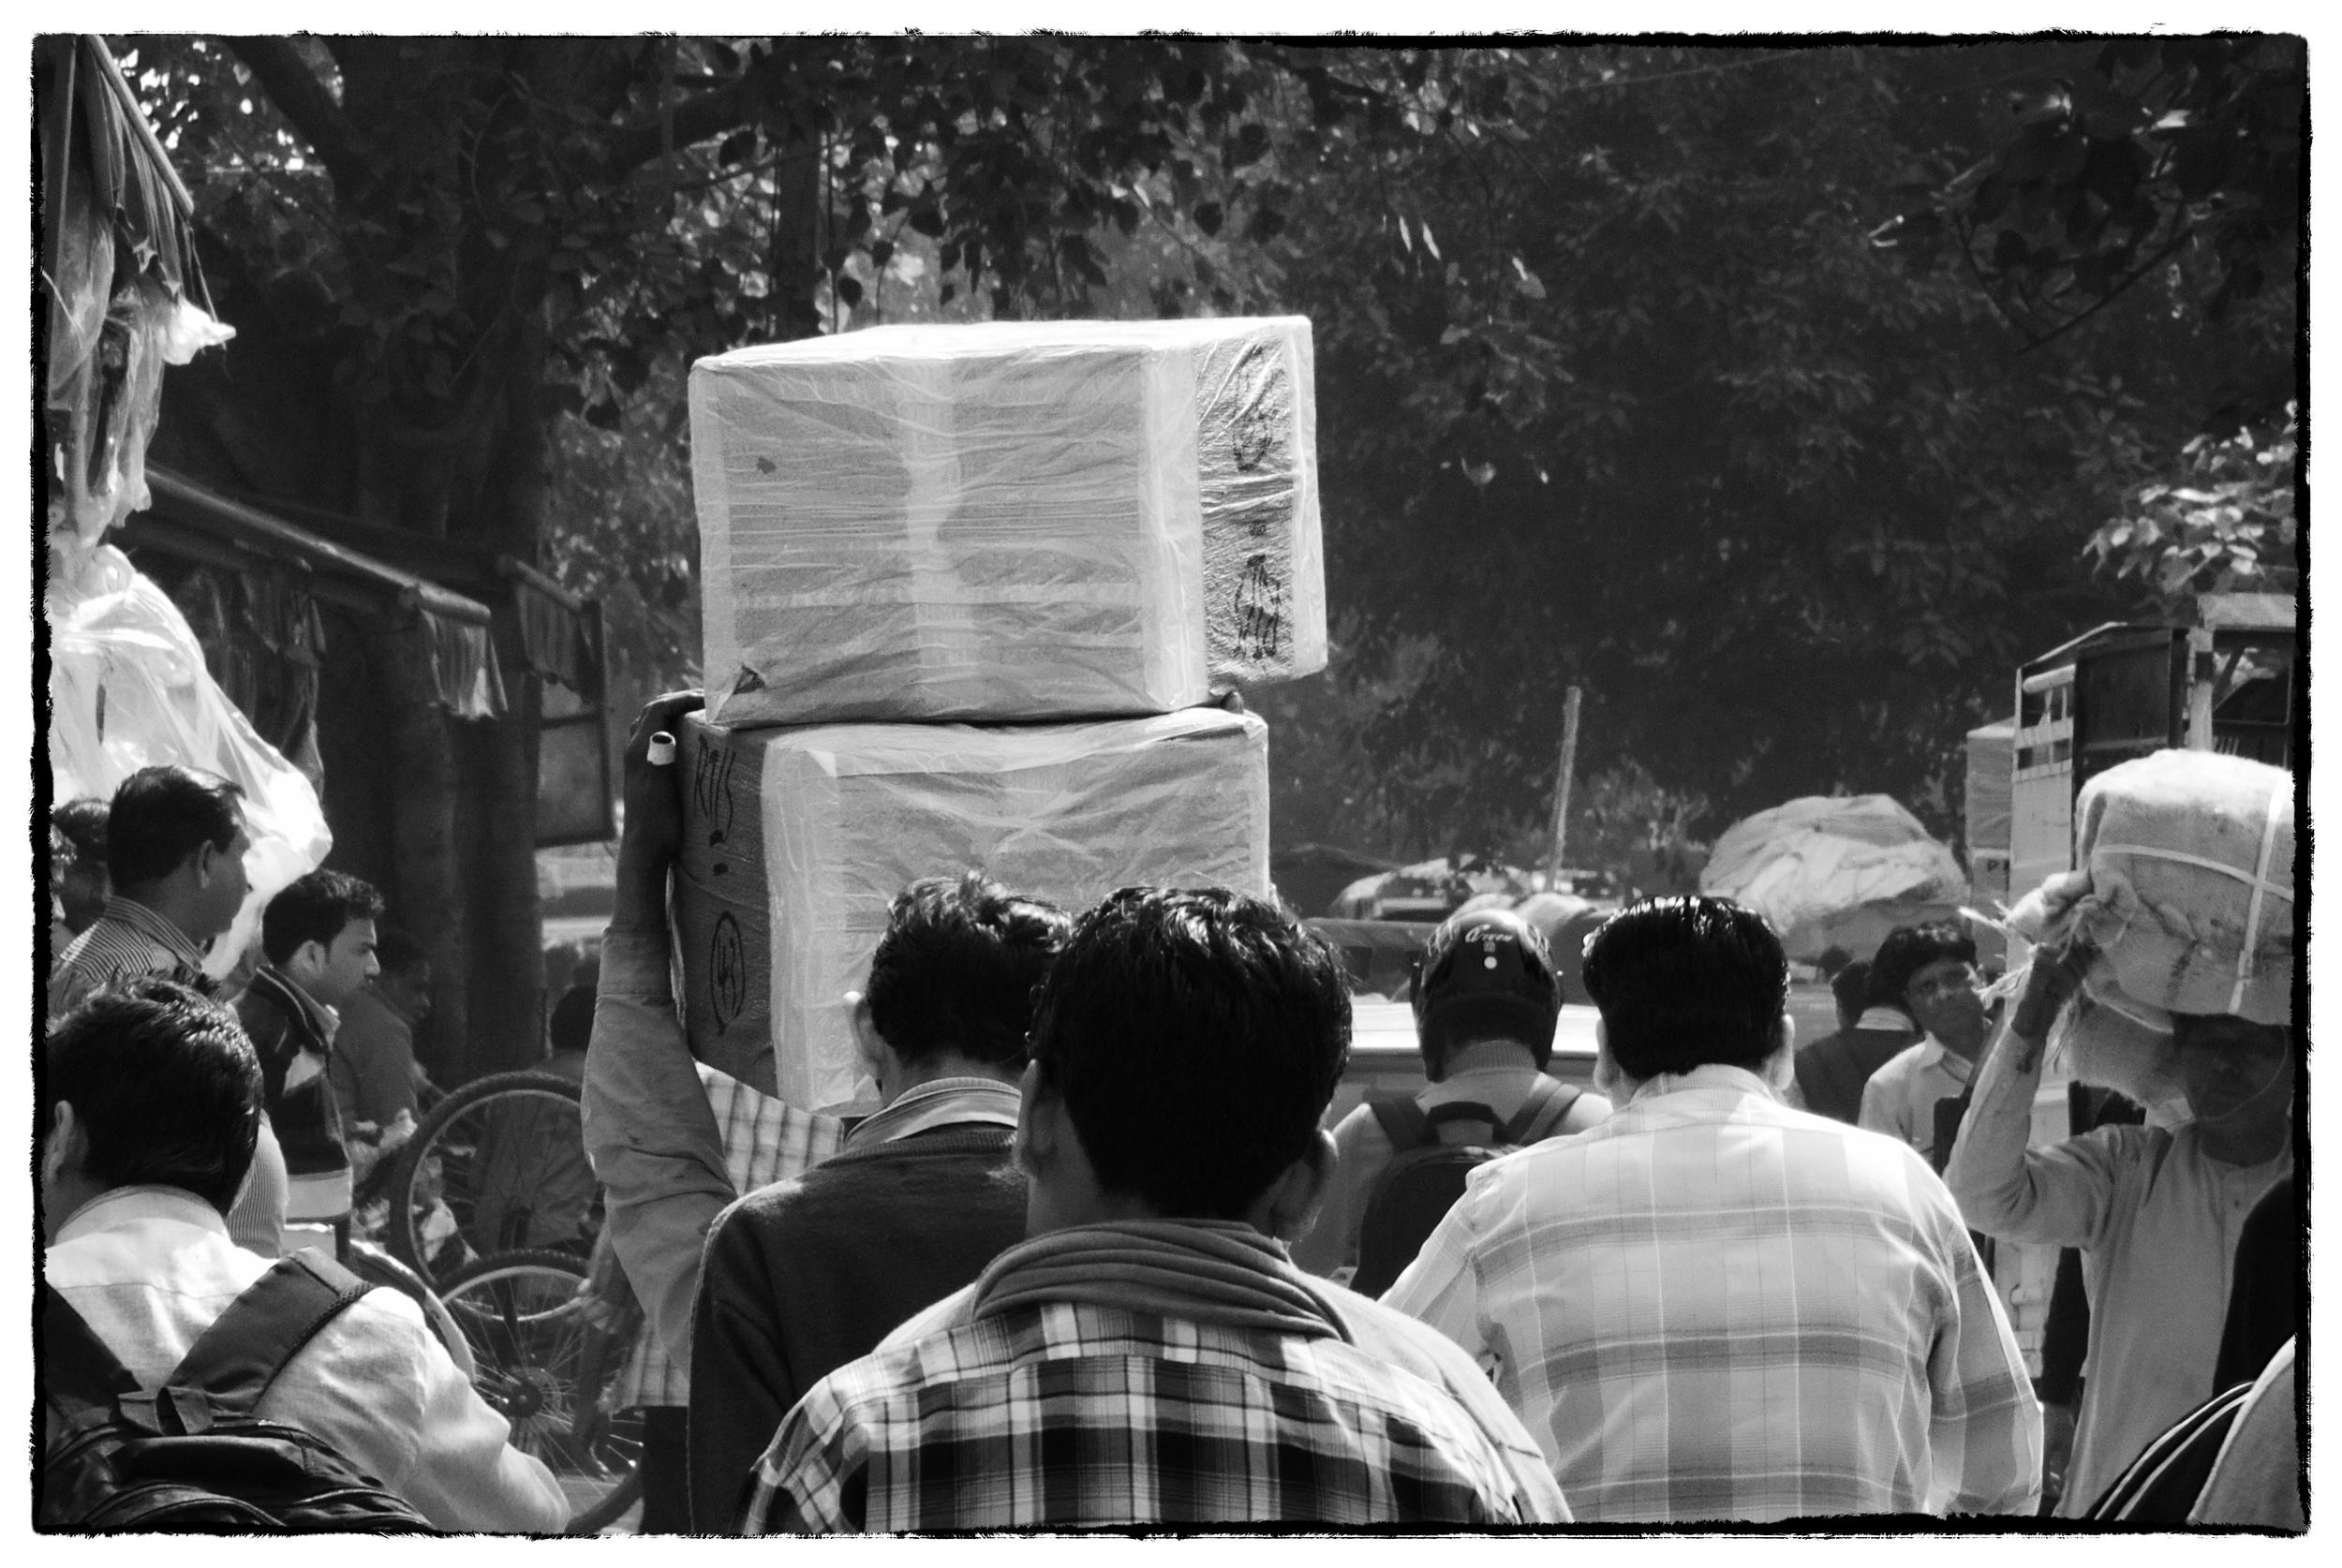 Chandni Chowk, Esplanade Road, Delhi (N1 V1 ,10-100mm Nikkor)